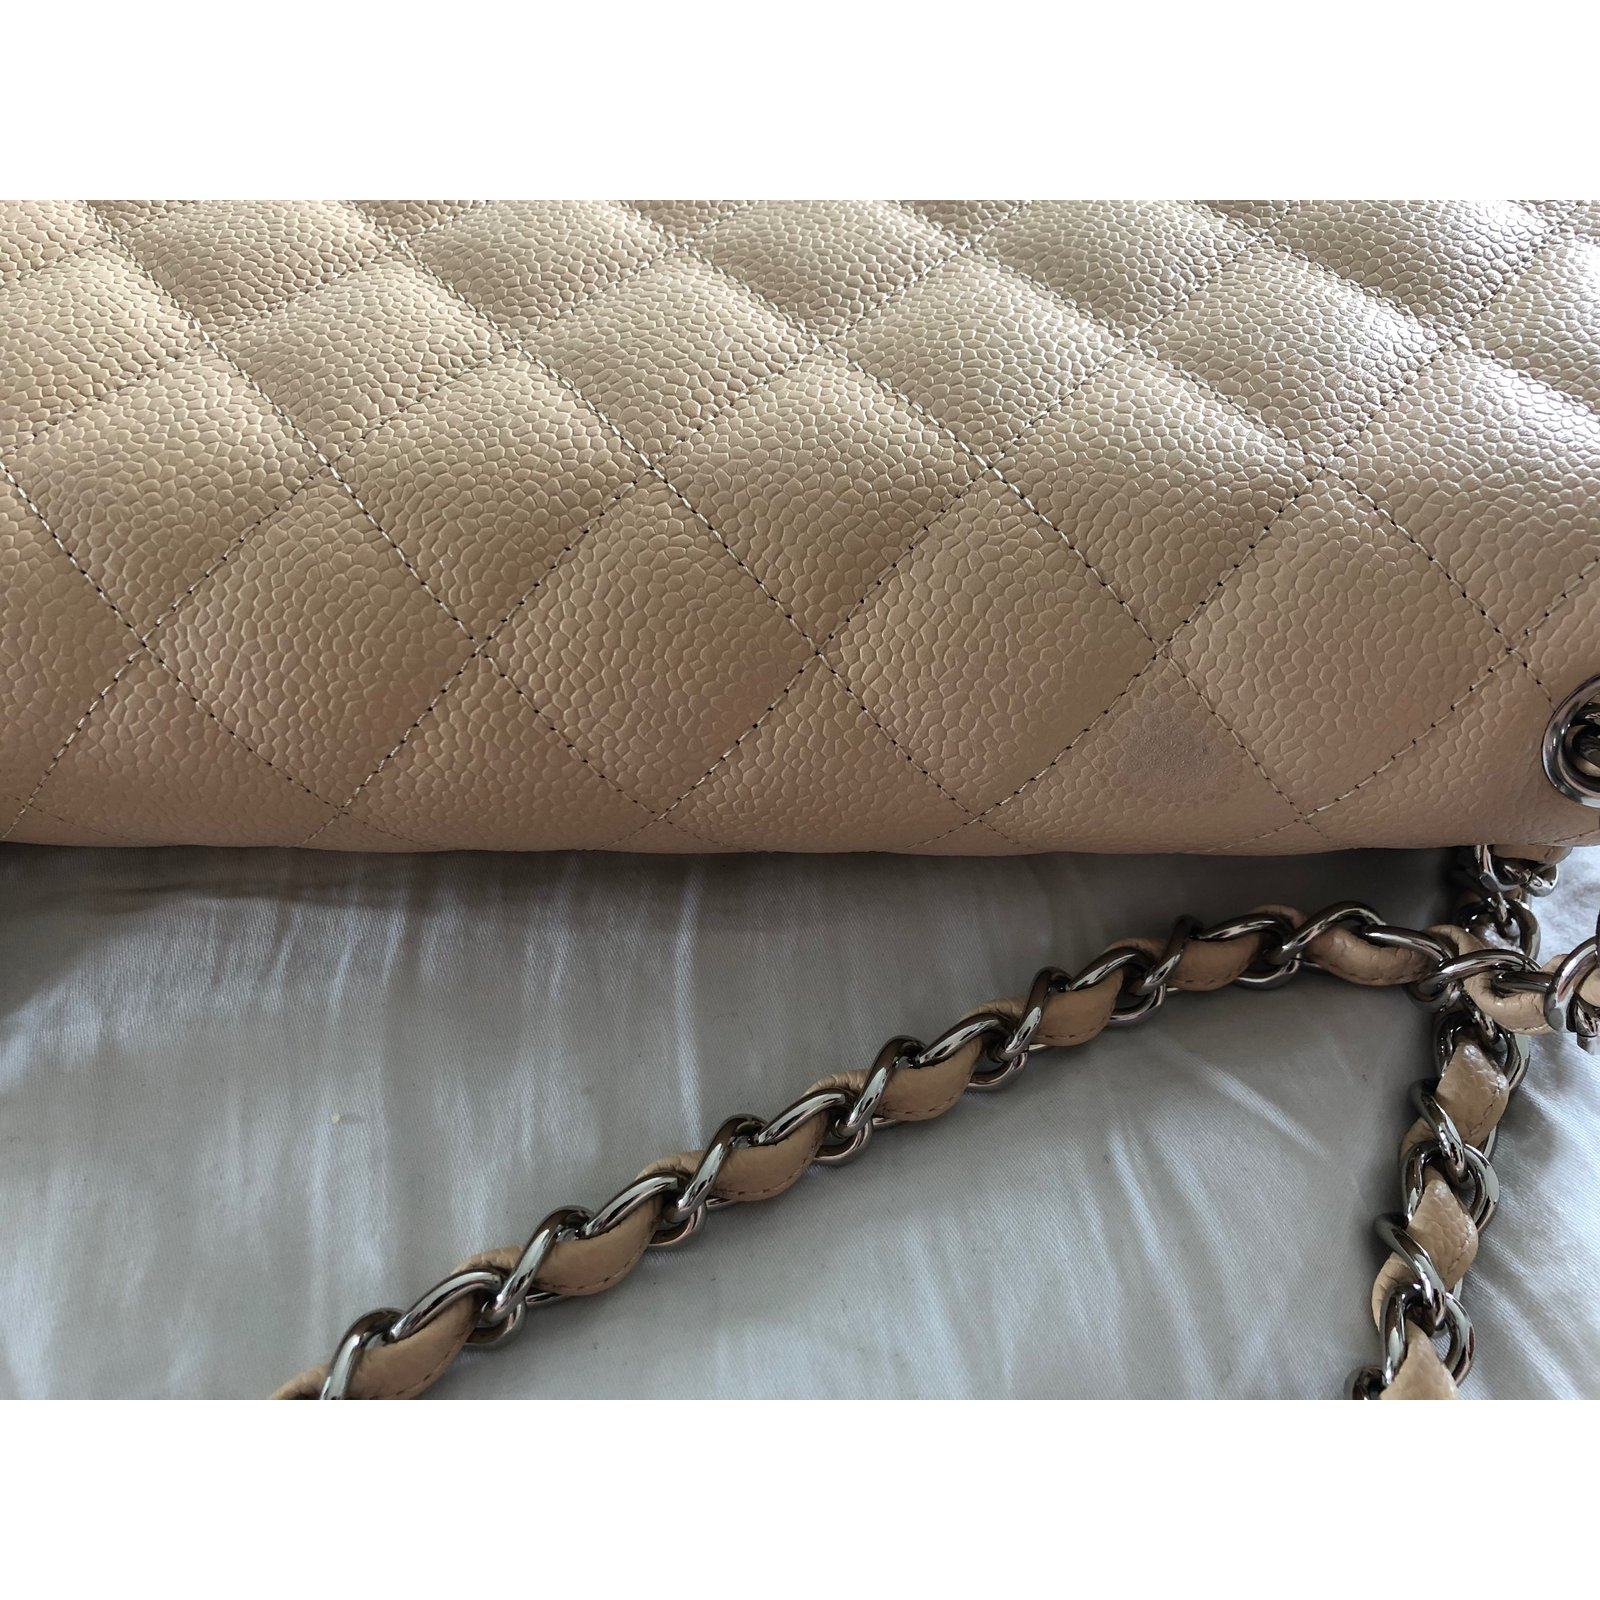 8a95e6dc9b6f86 Chanel Jumbo lined Flap bag Handbags Leather Beige ref.75132 - Joli Closet